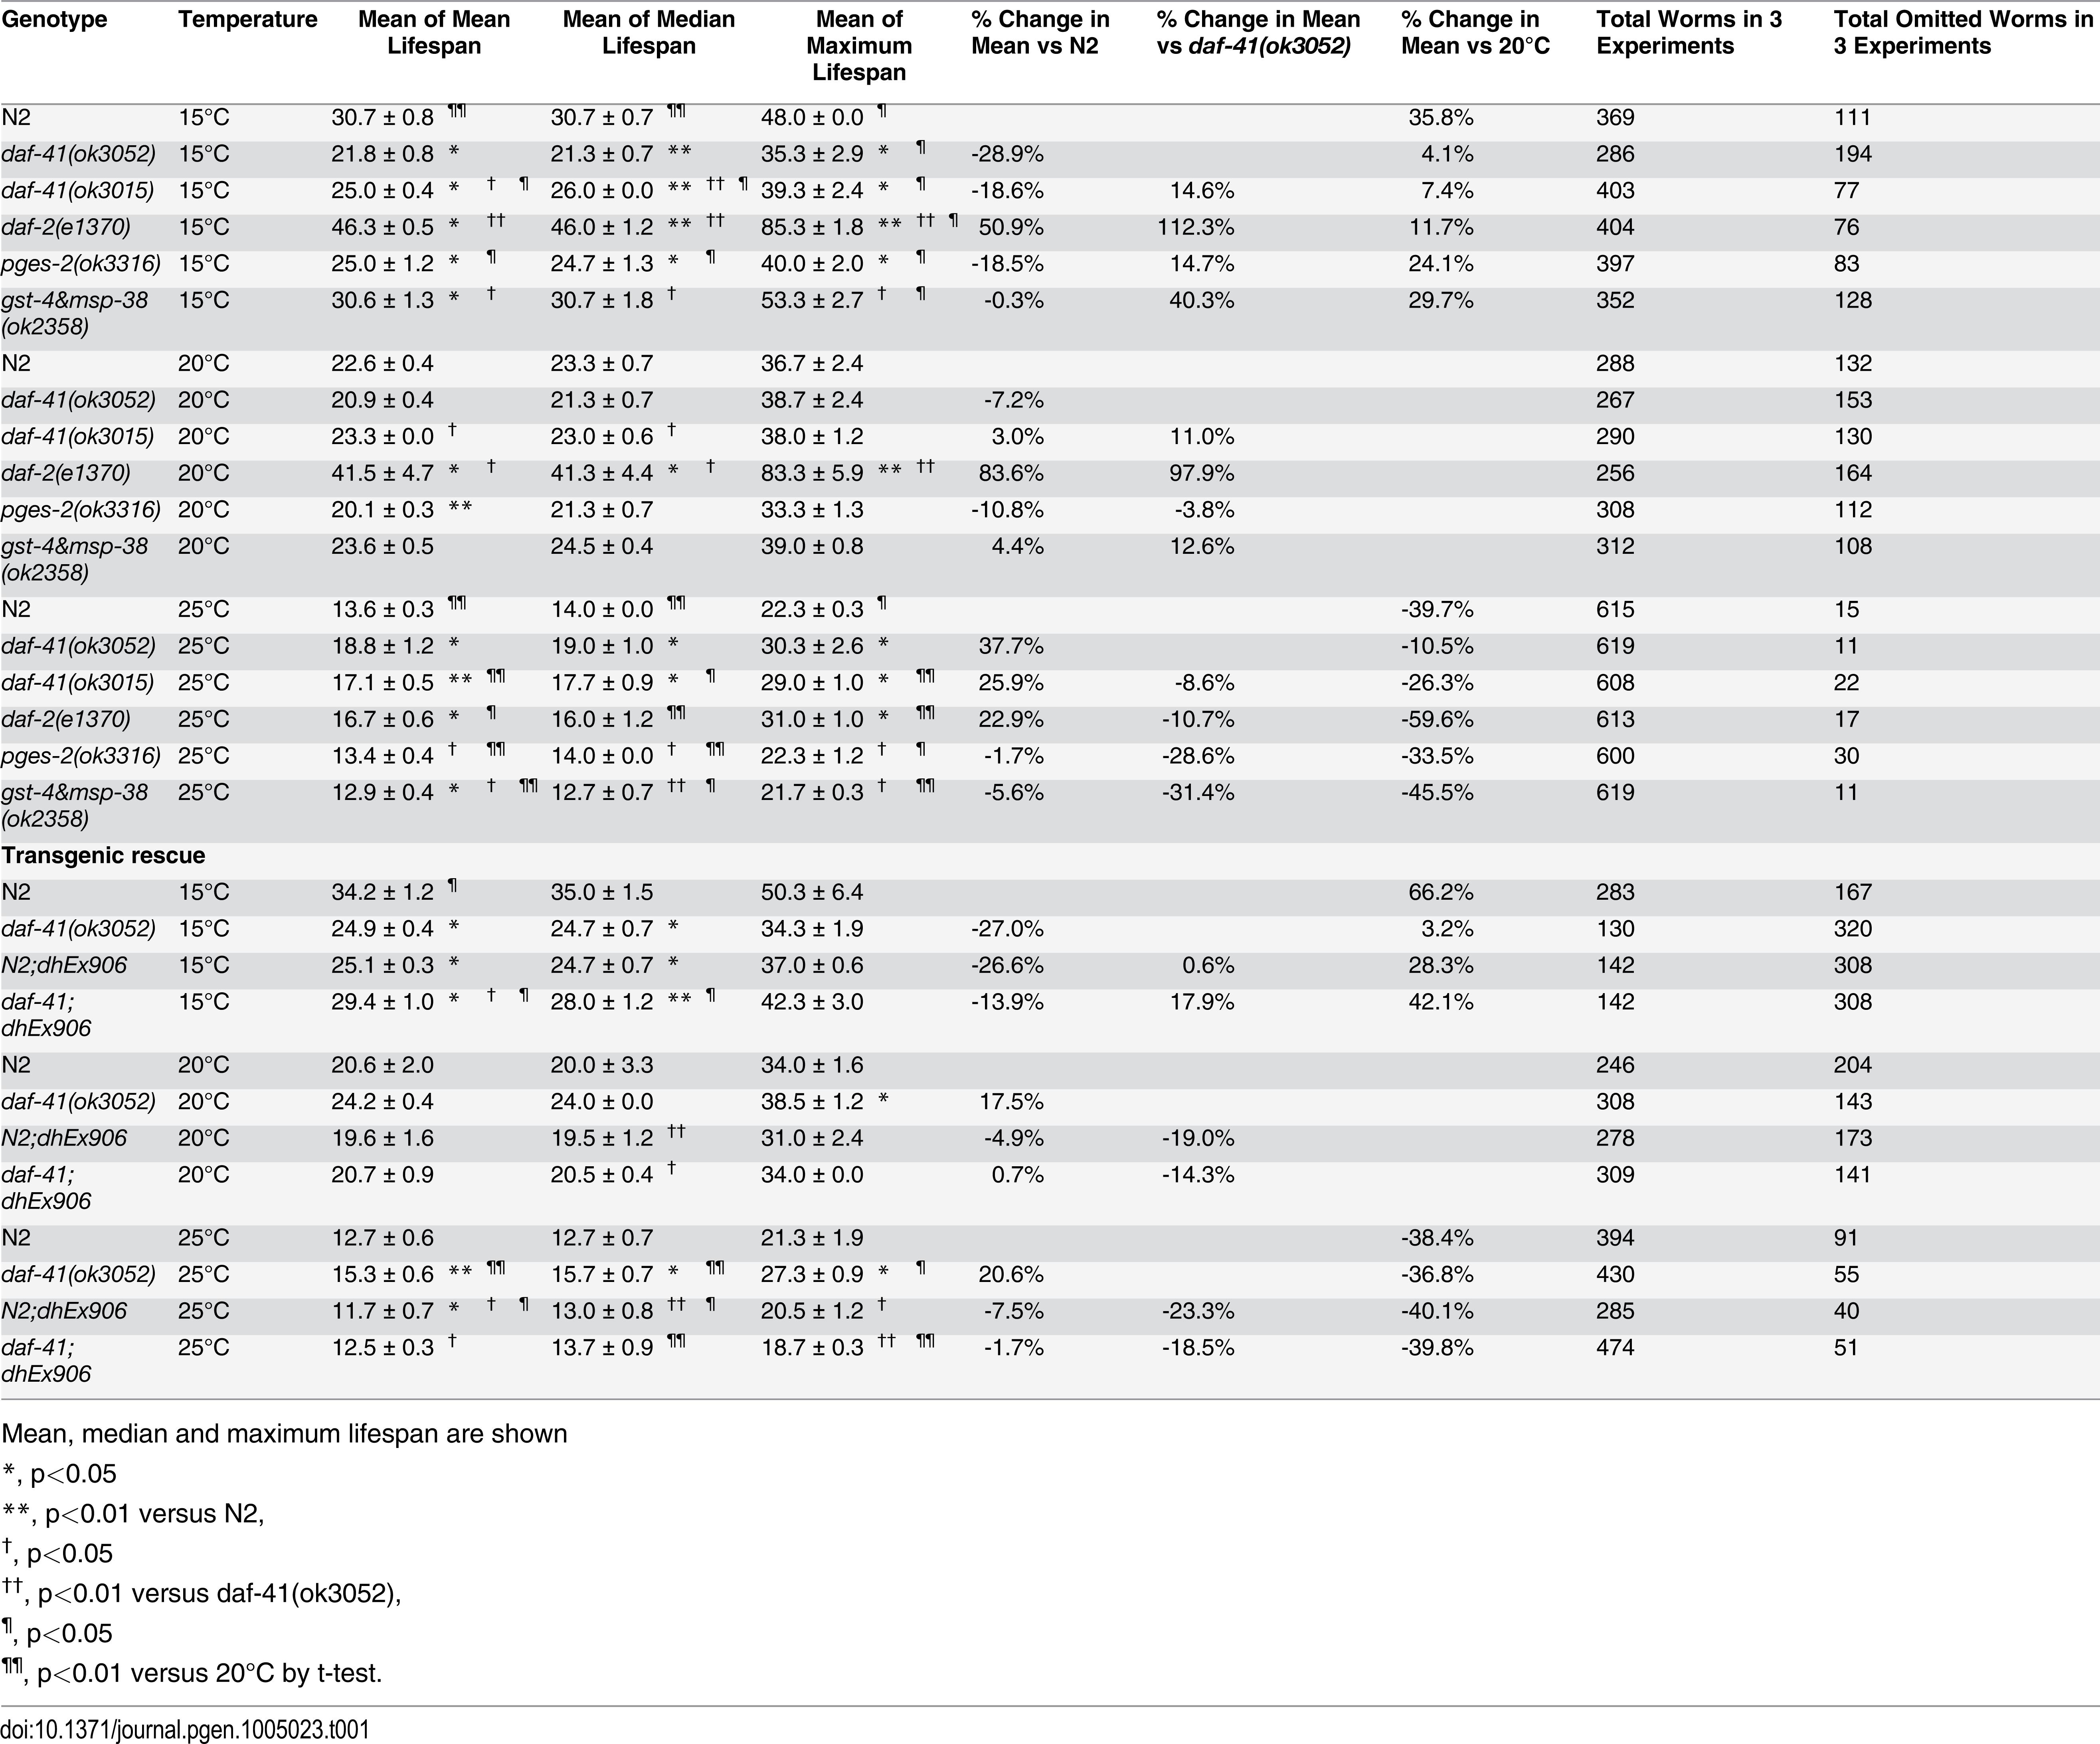 Ageing data of daf-41 mutants.